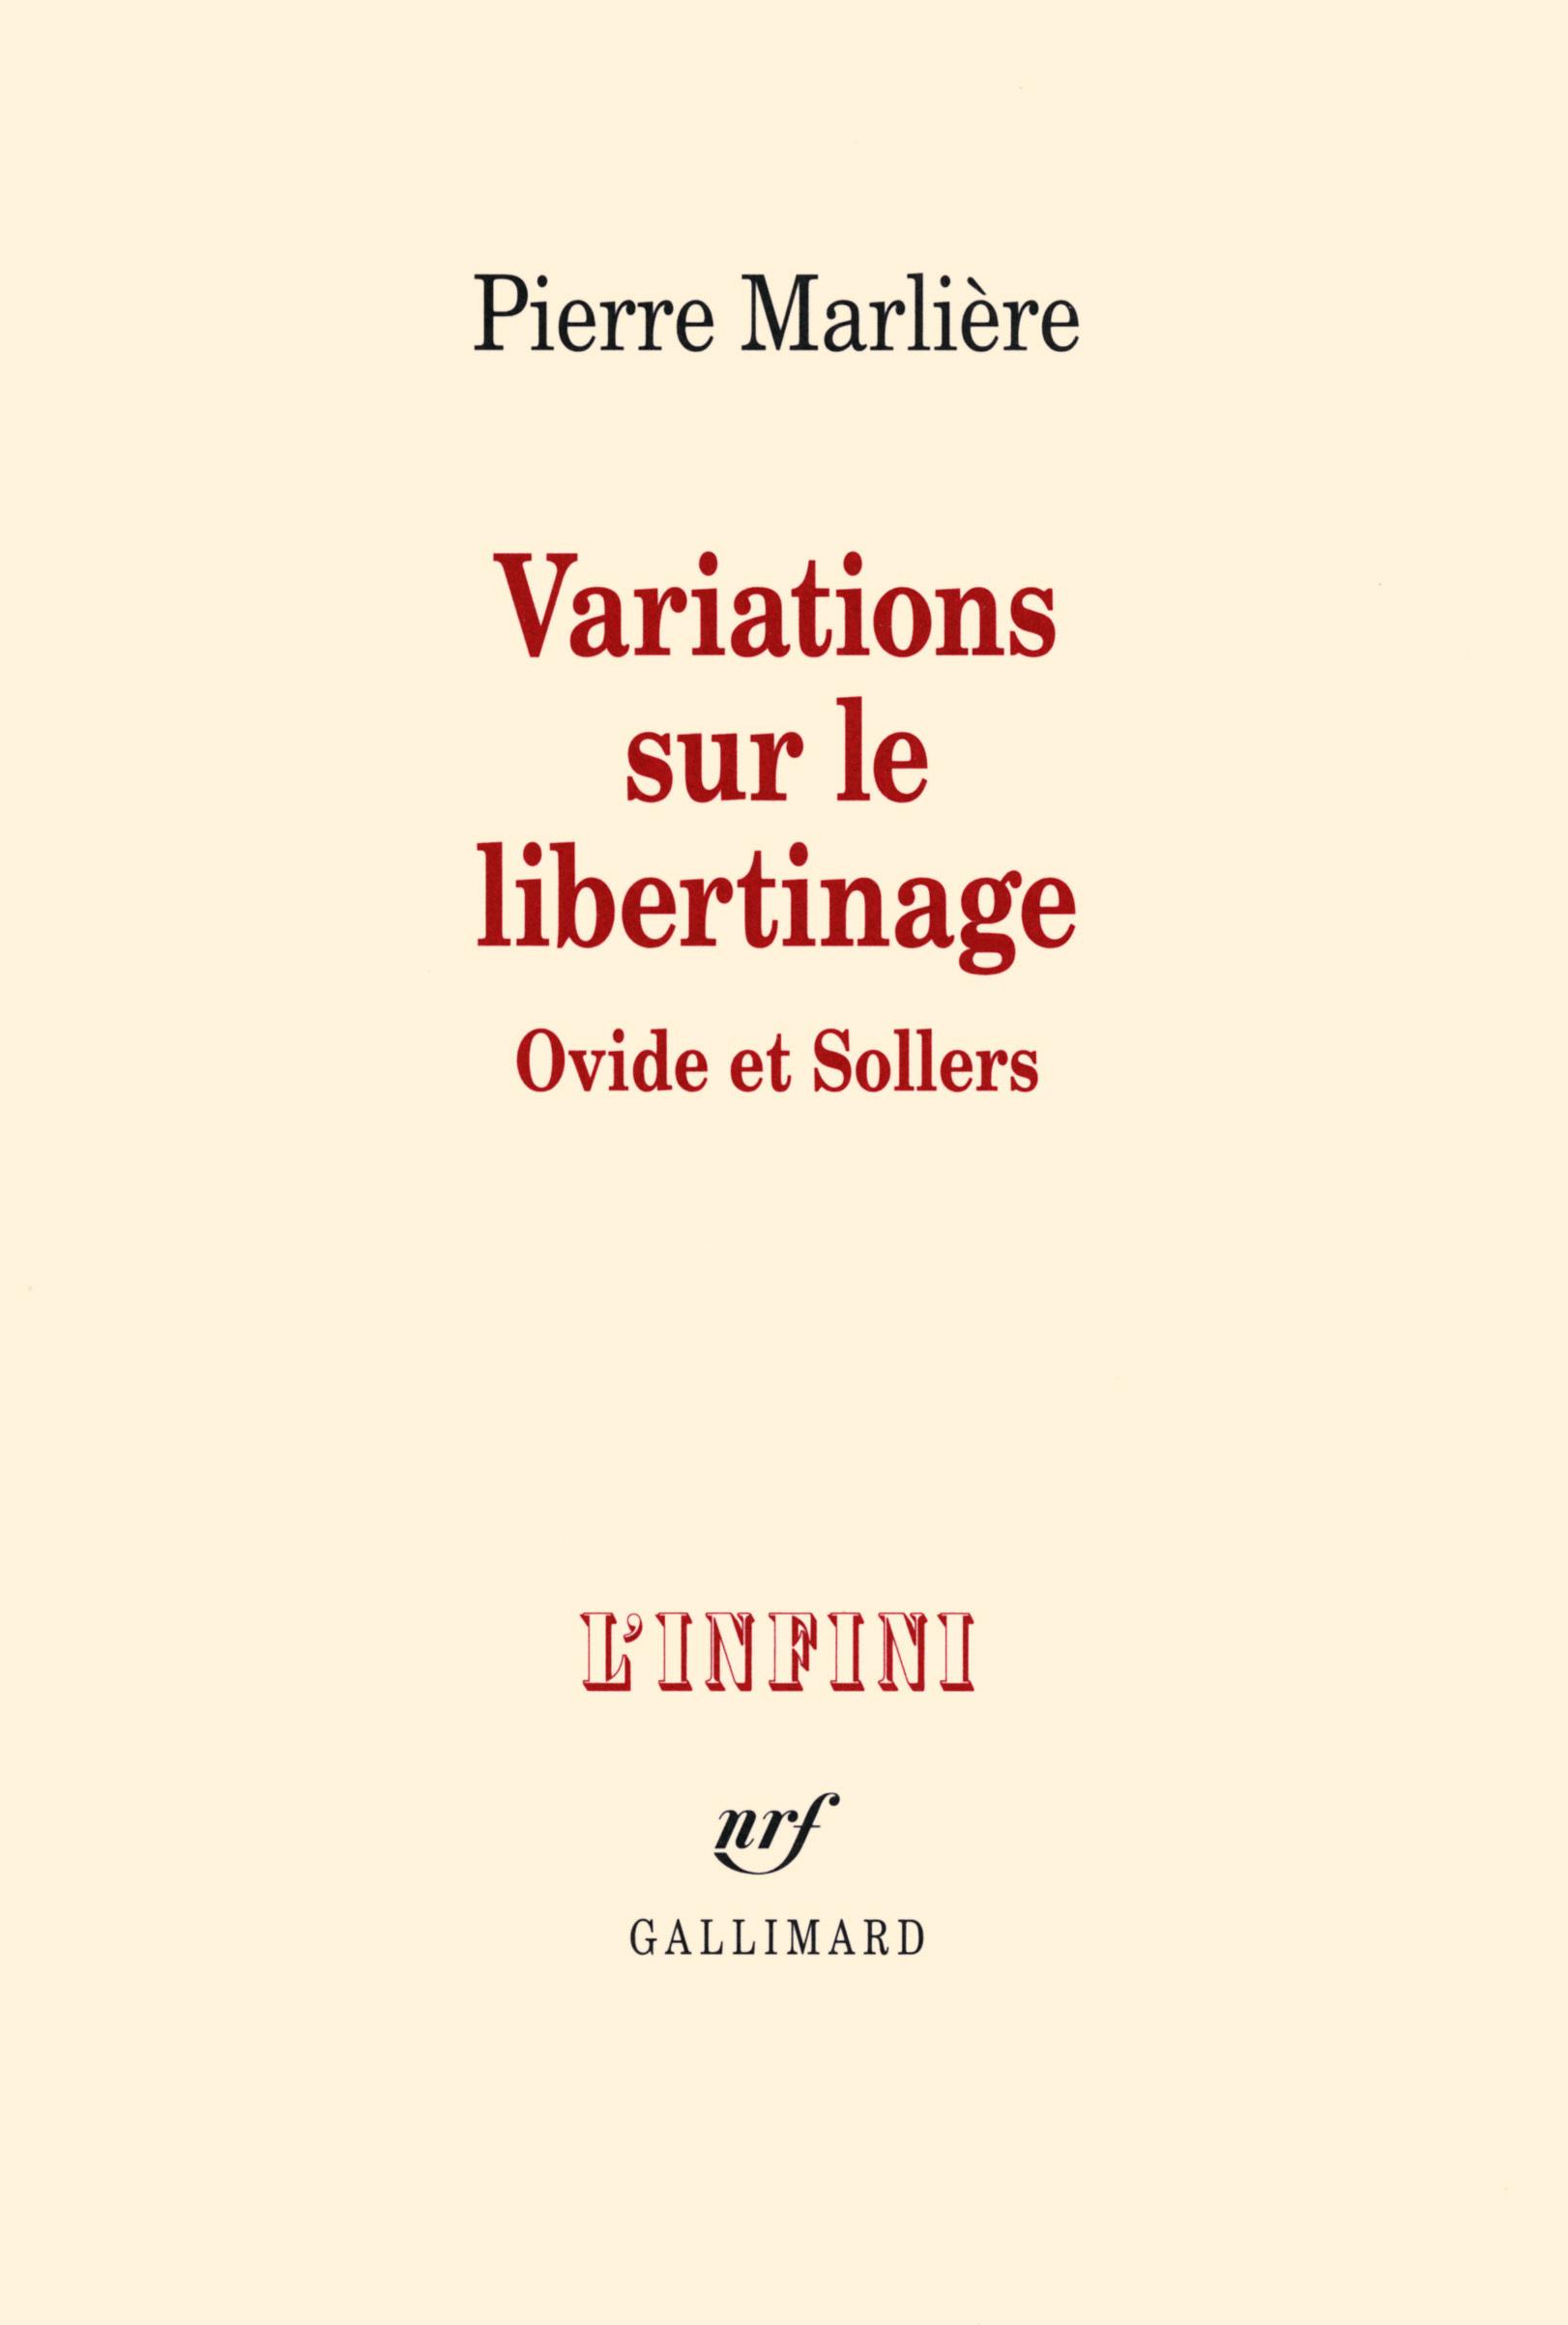 Variations sur le libertinage. Ovide et Sollers